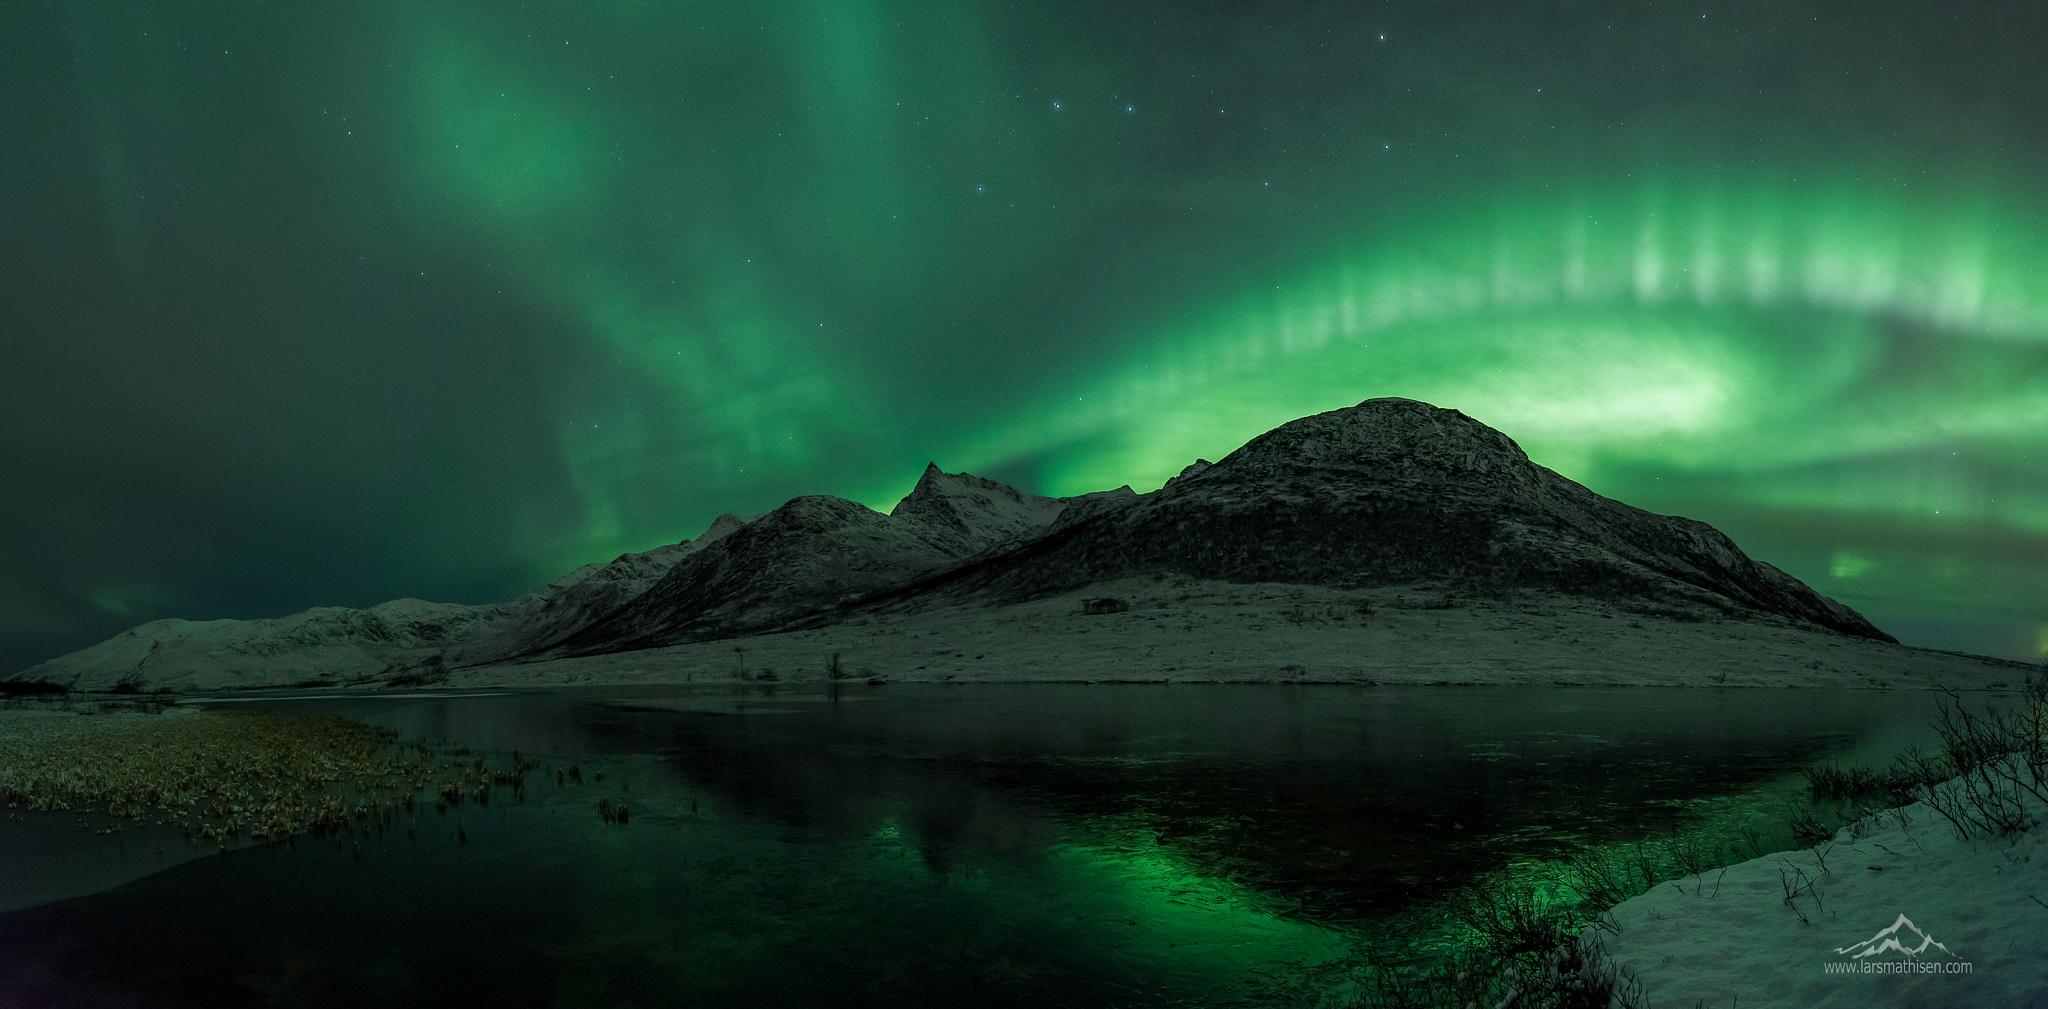 The Great Bear by LarsMathisen